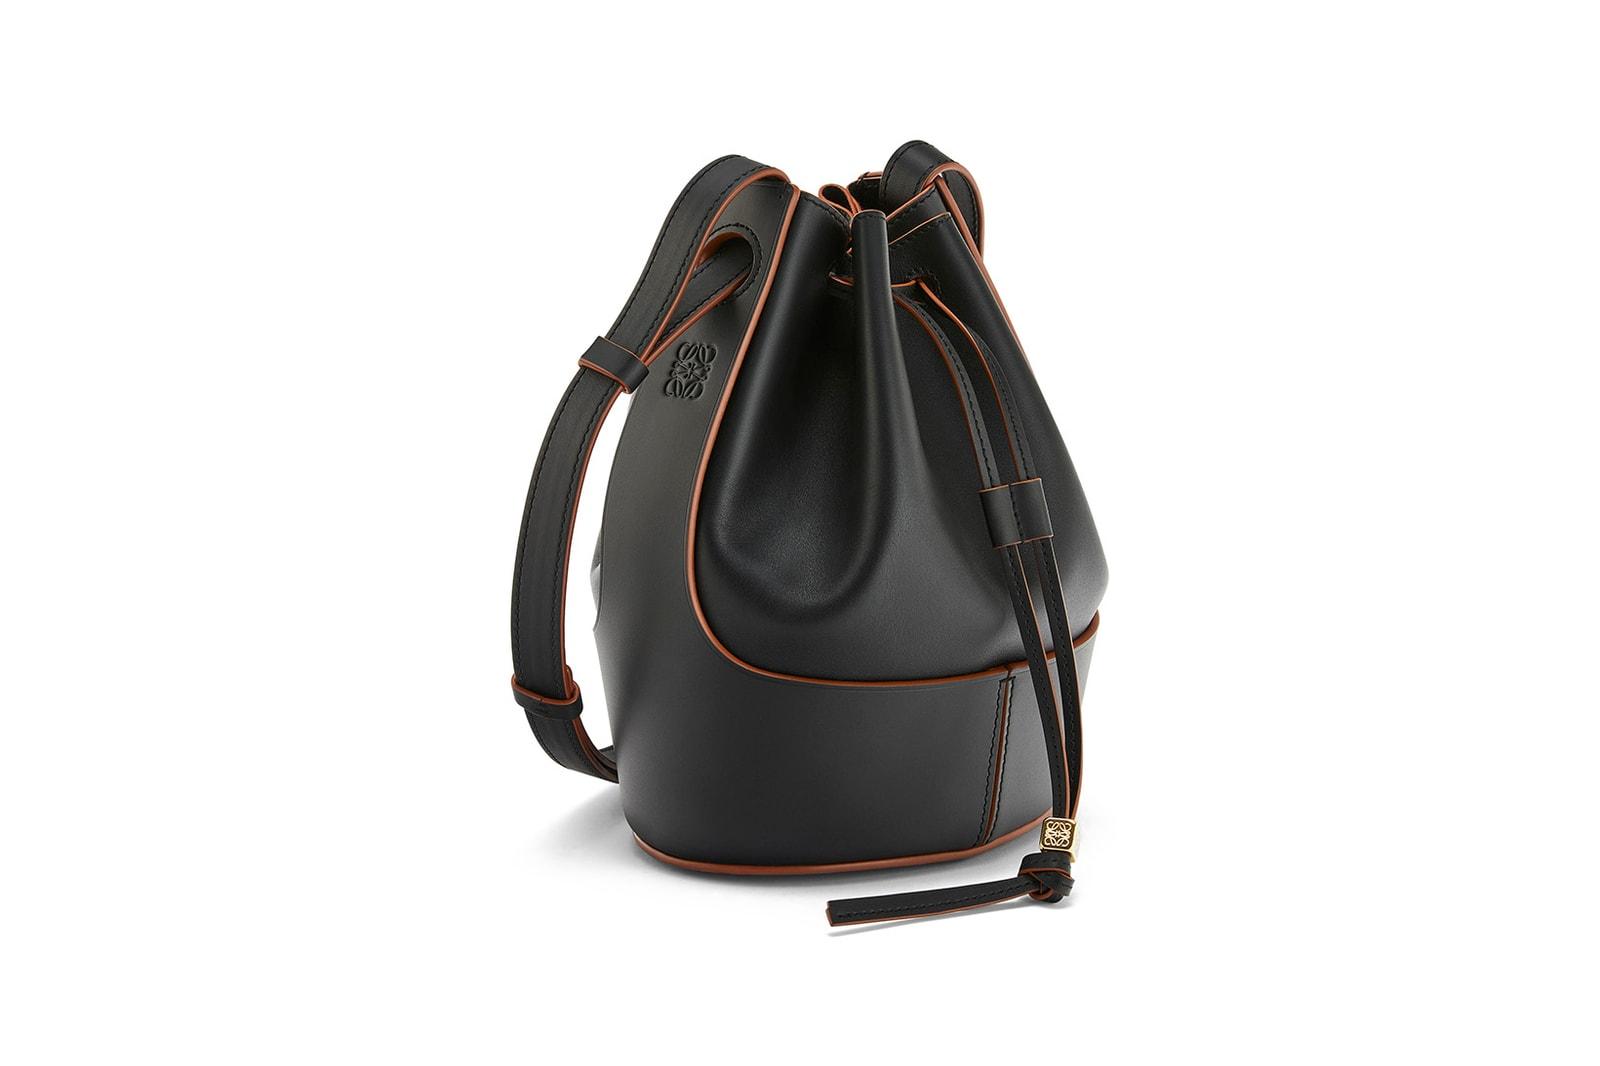 Loewe Balloon Bag Black